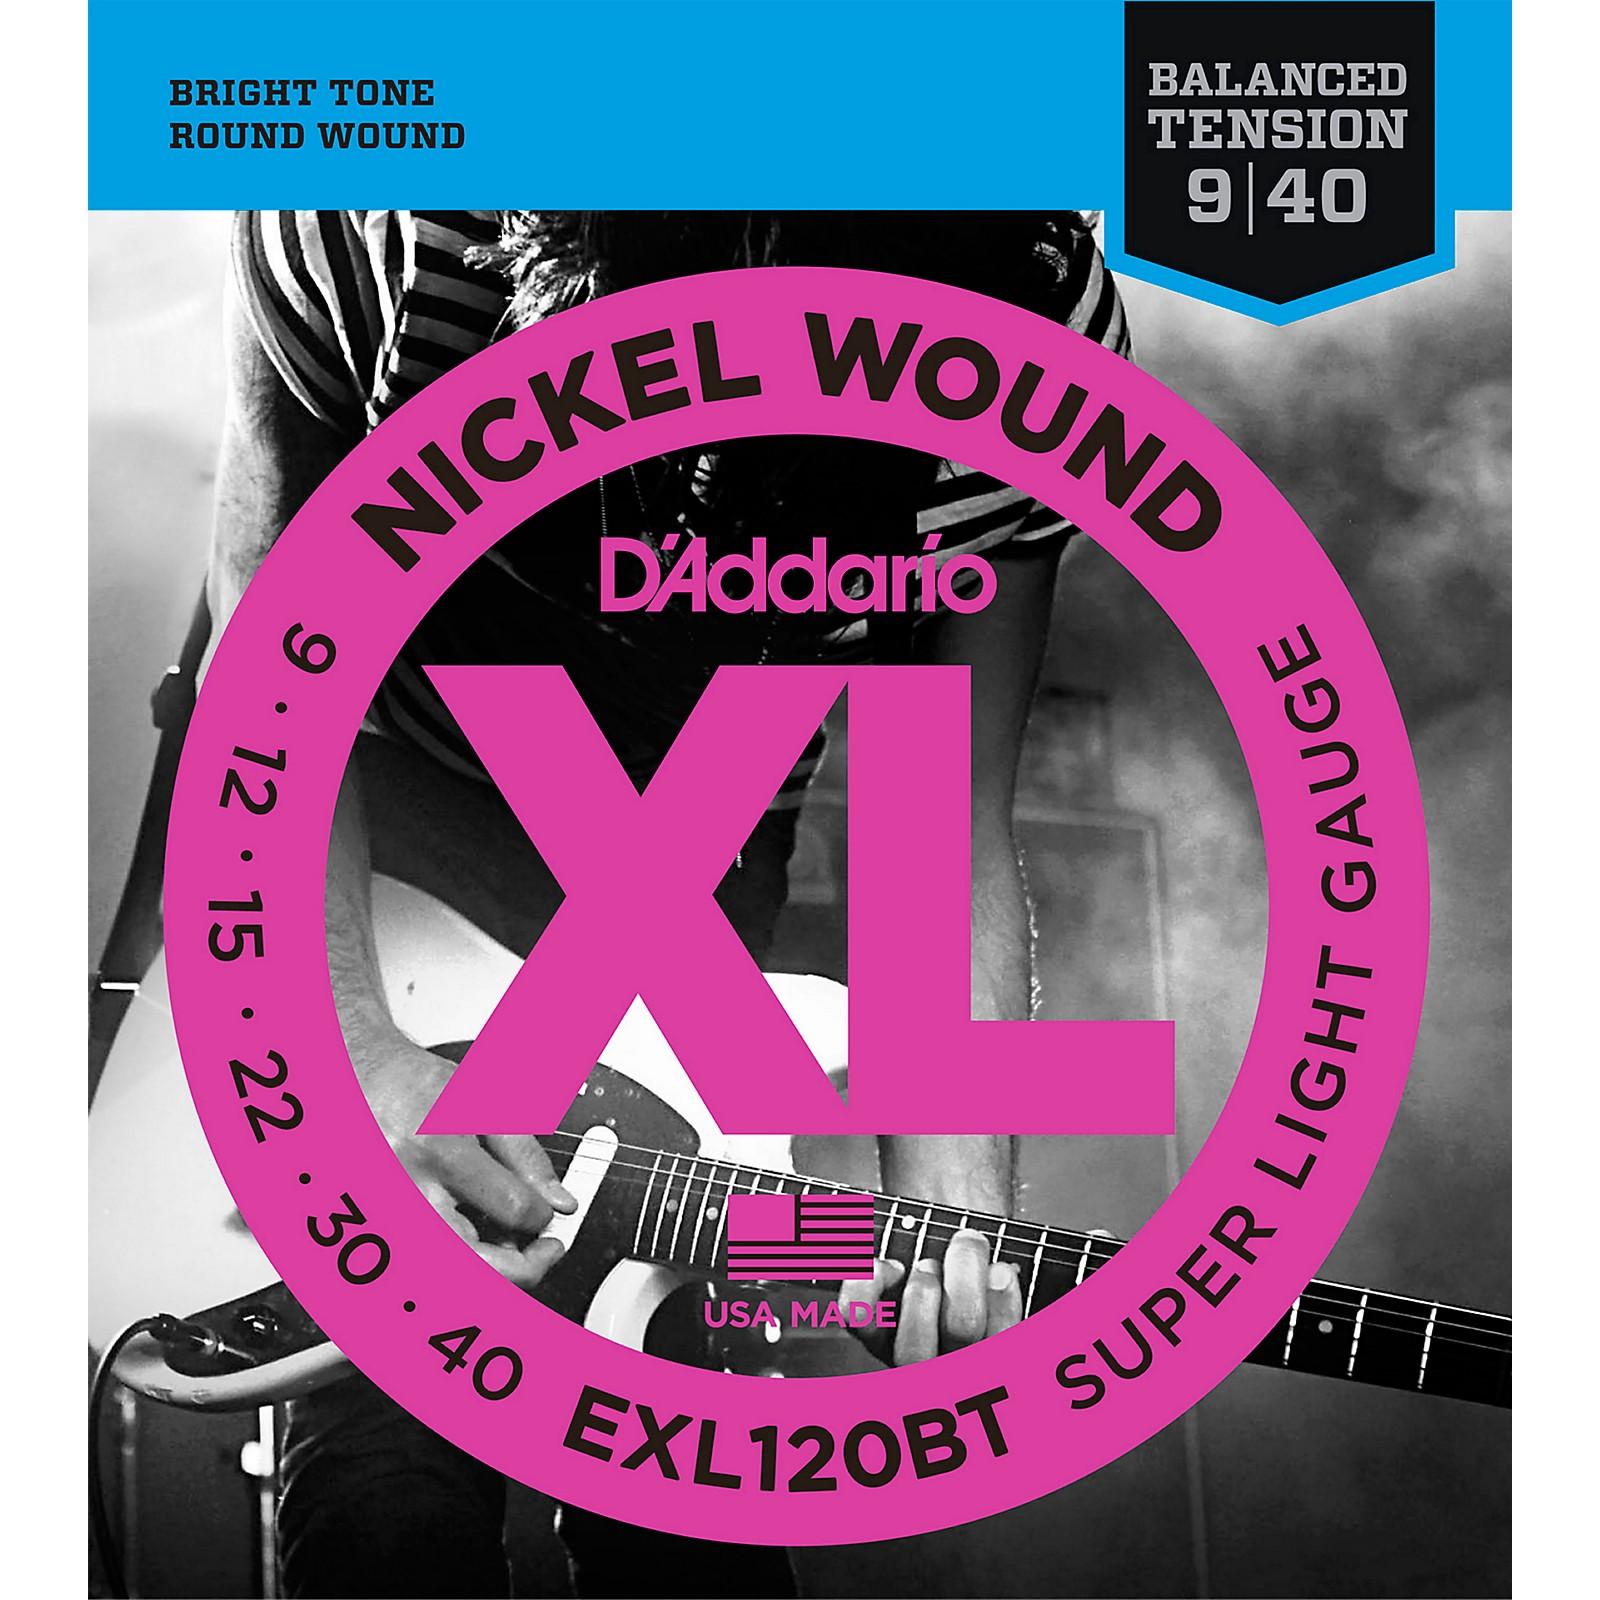 D'Addario EXL120BT Balanced Tension X-Lite Electric Guitar Strings Single-Pack